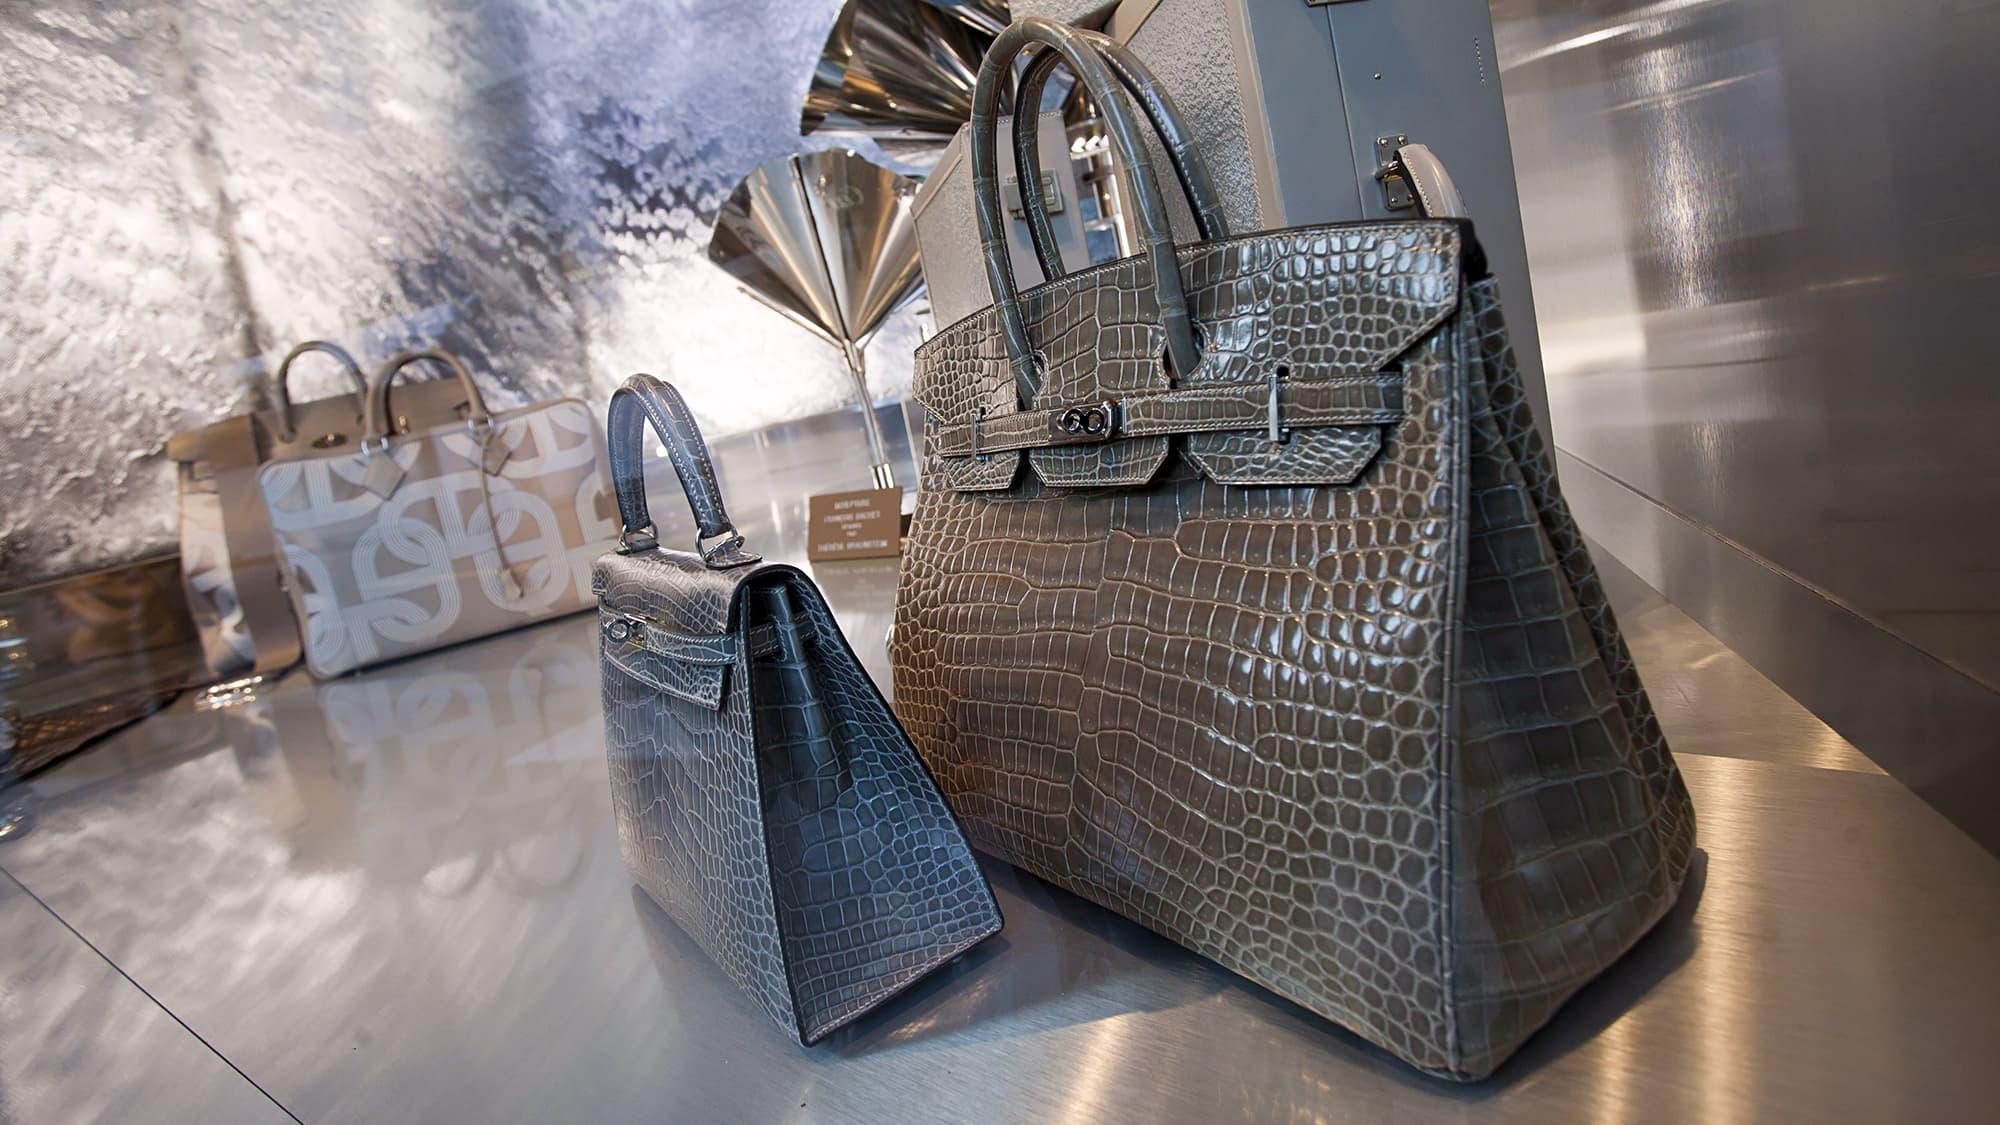 8b20e85c0f6c Pawn my handbag  How women use designer accessories to raise cash